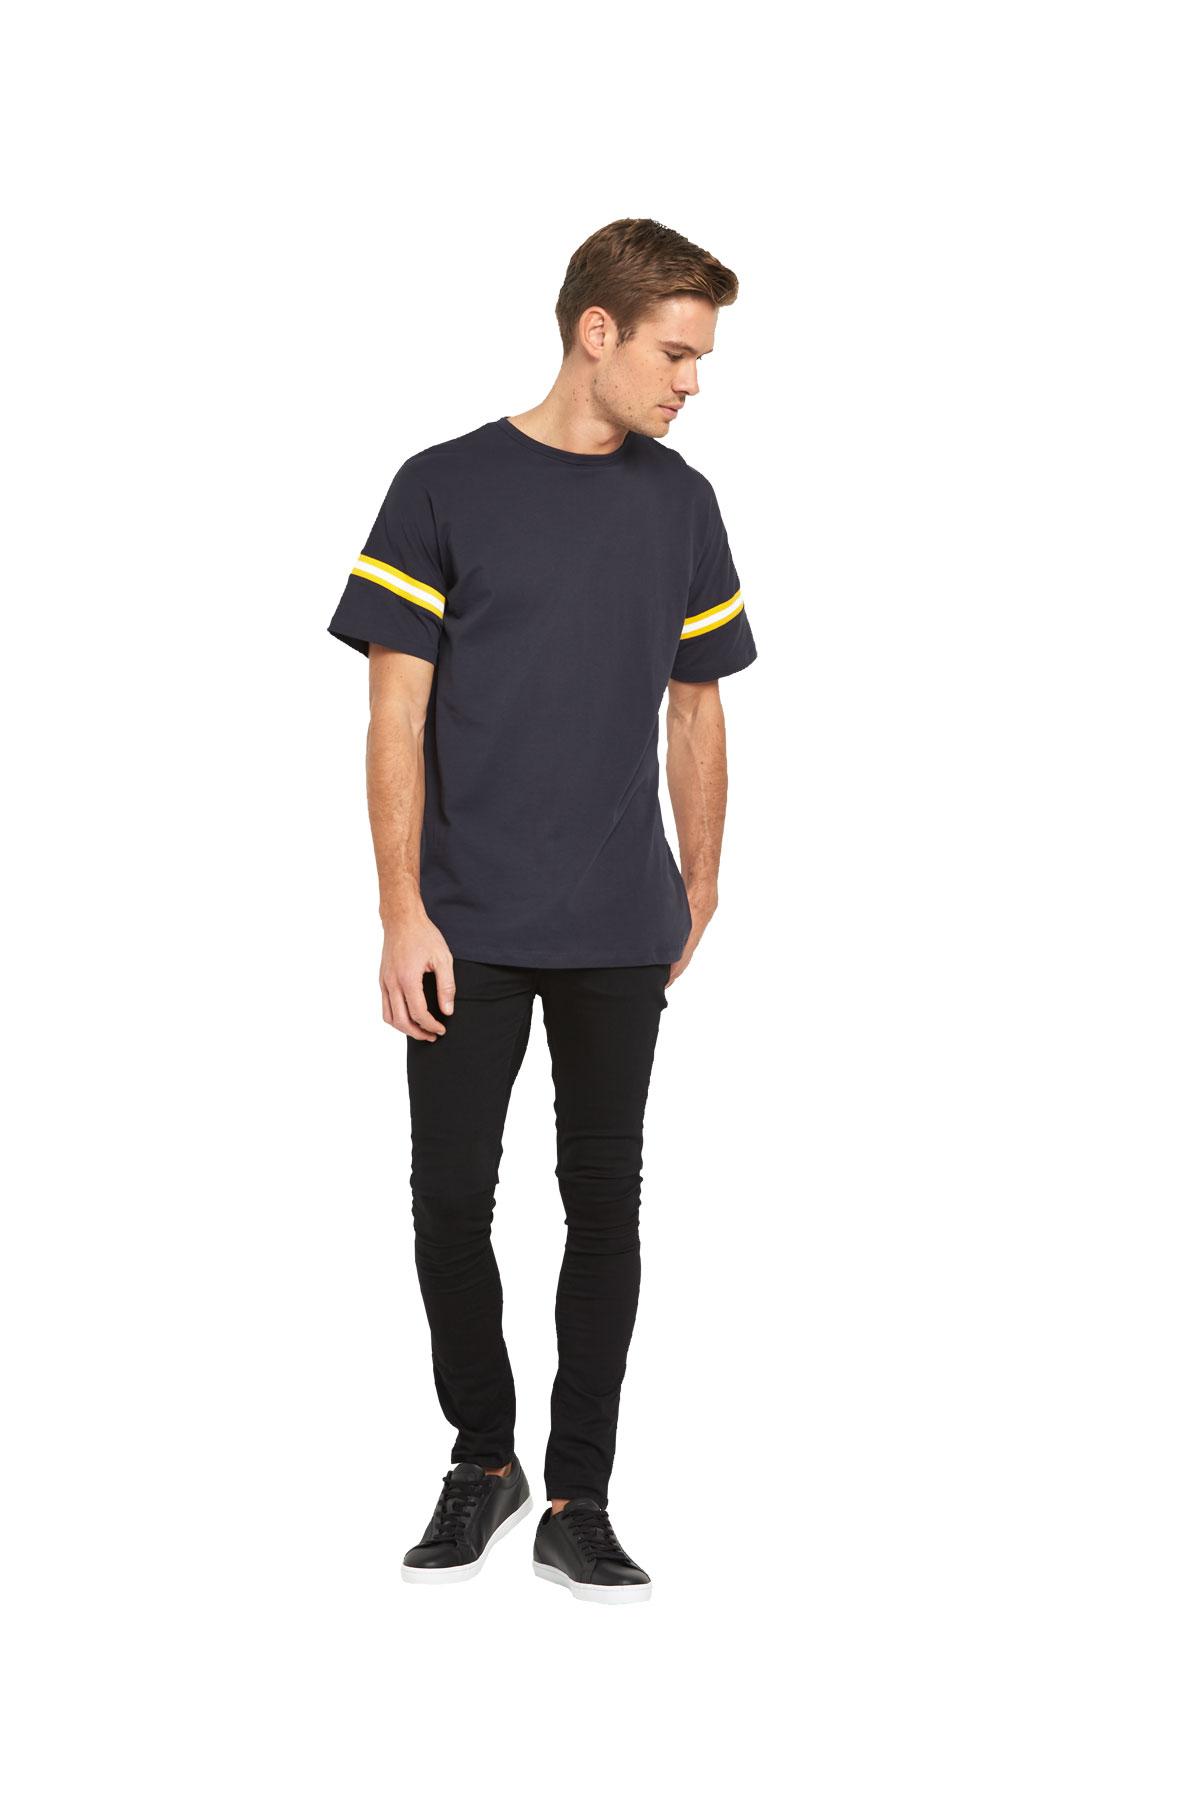 Adpt Learn Short Sleeve T-Shirt